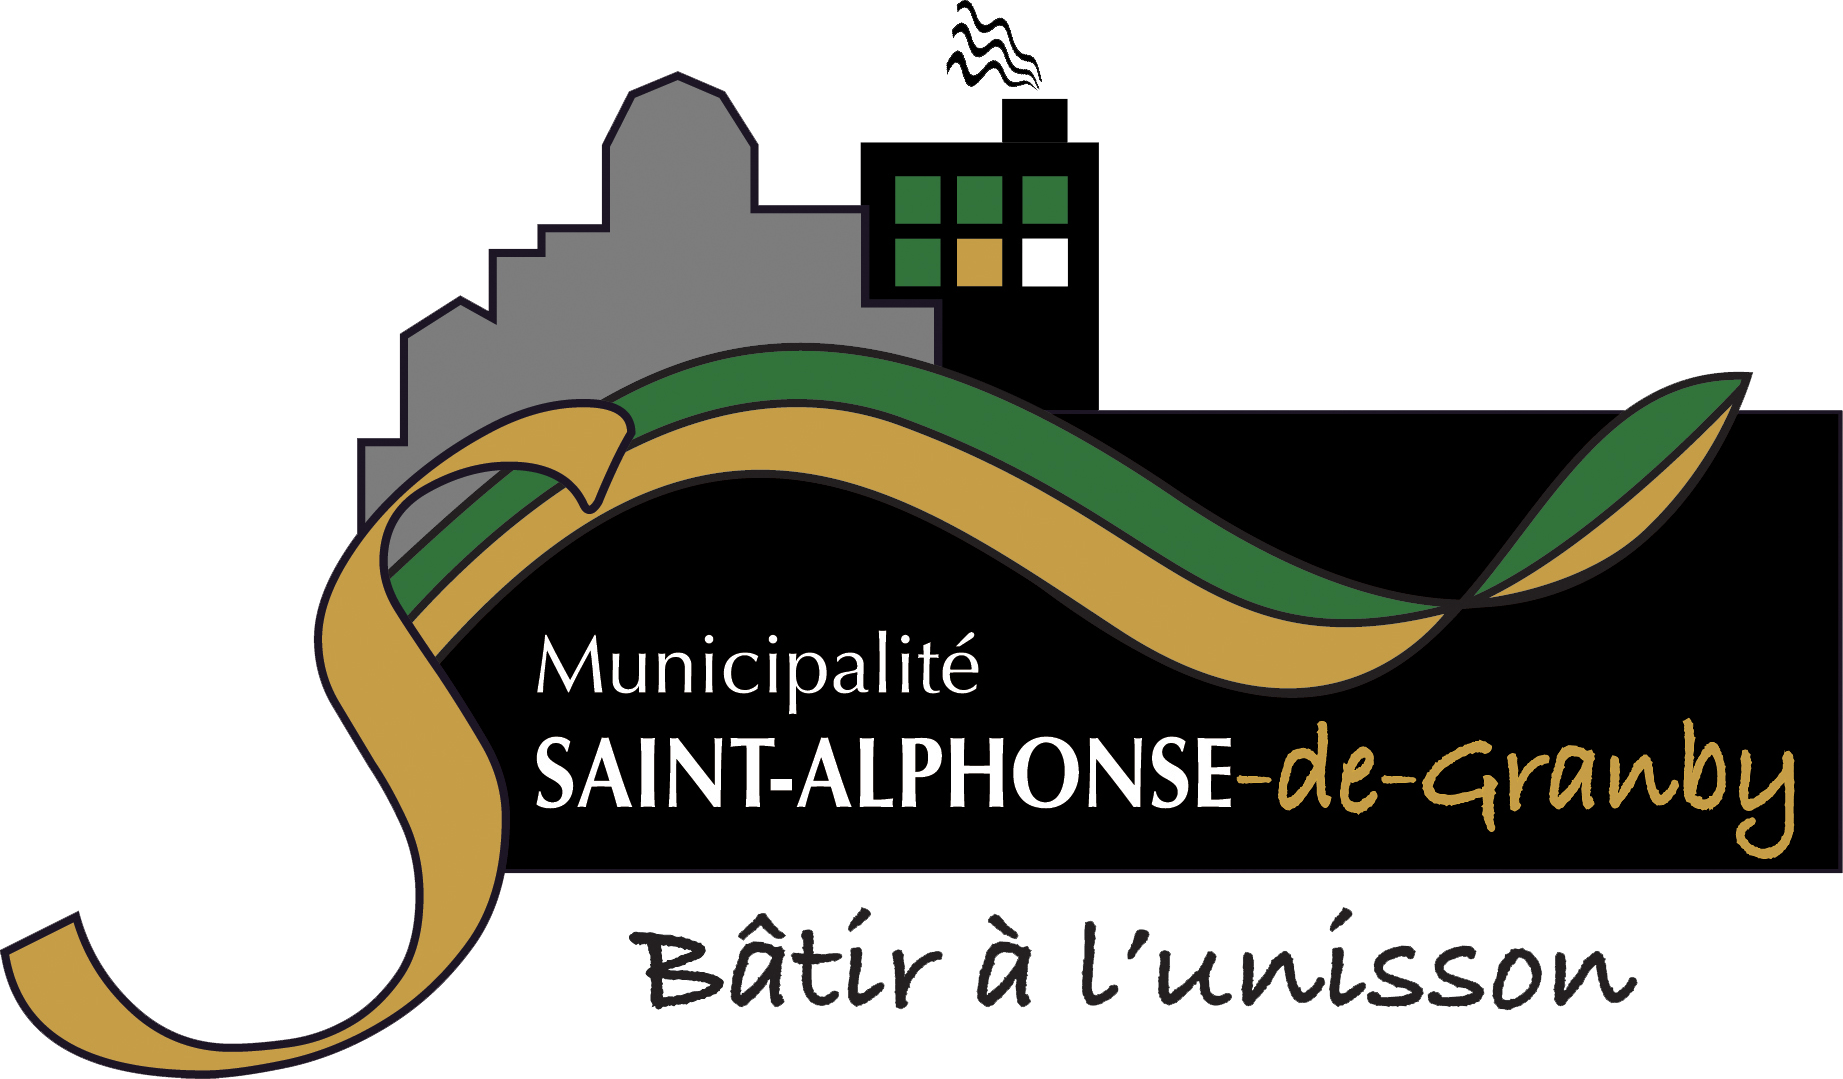 St-Alphonse-de-Granby